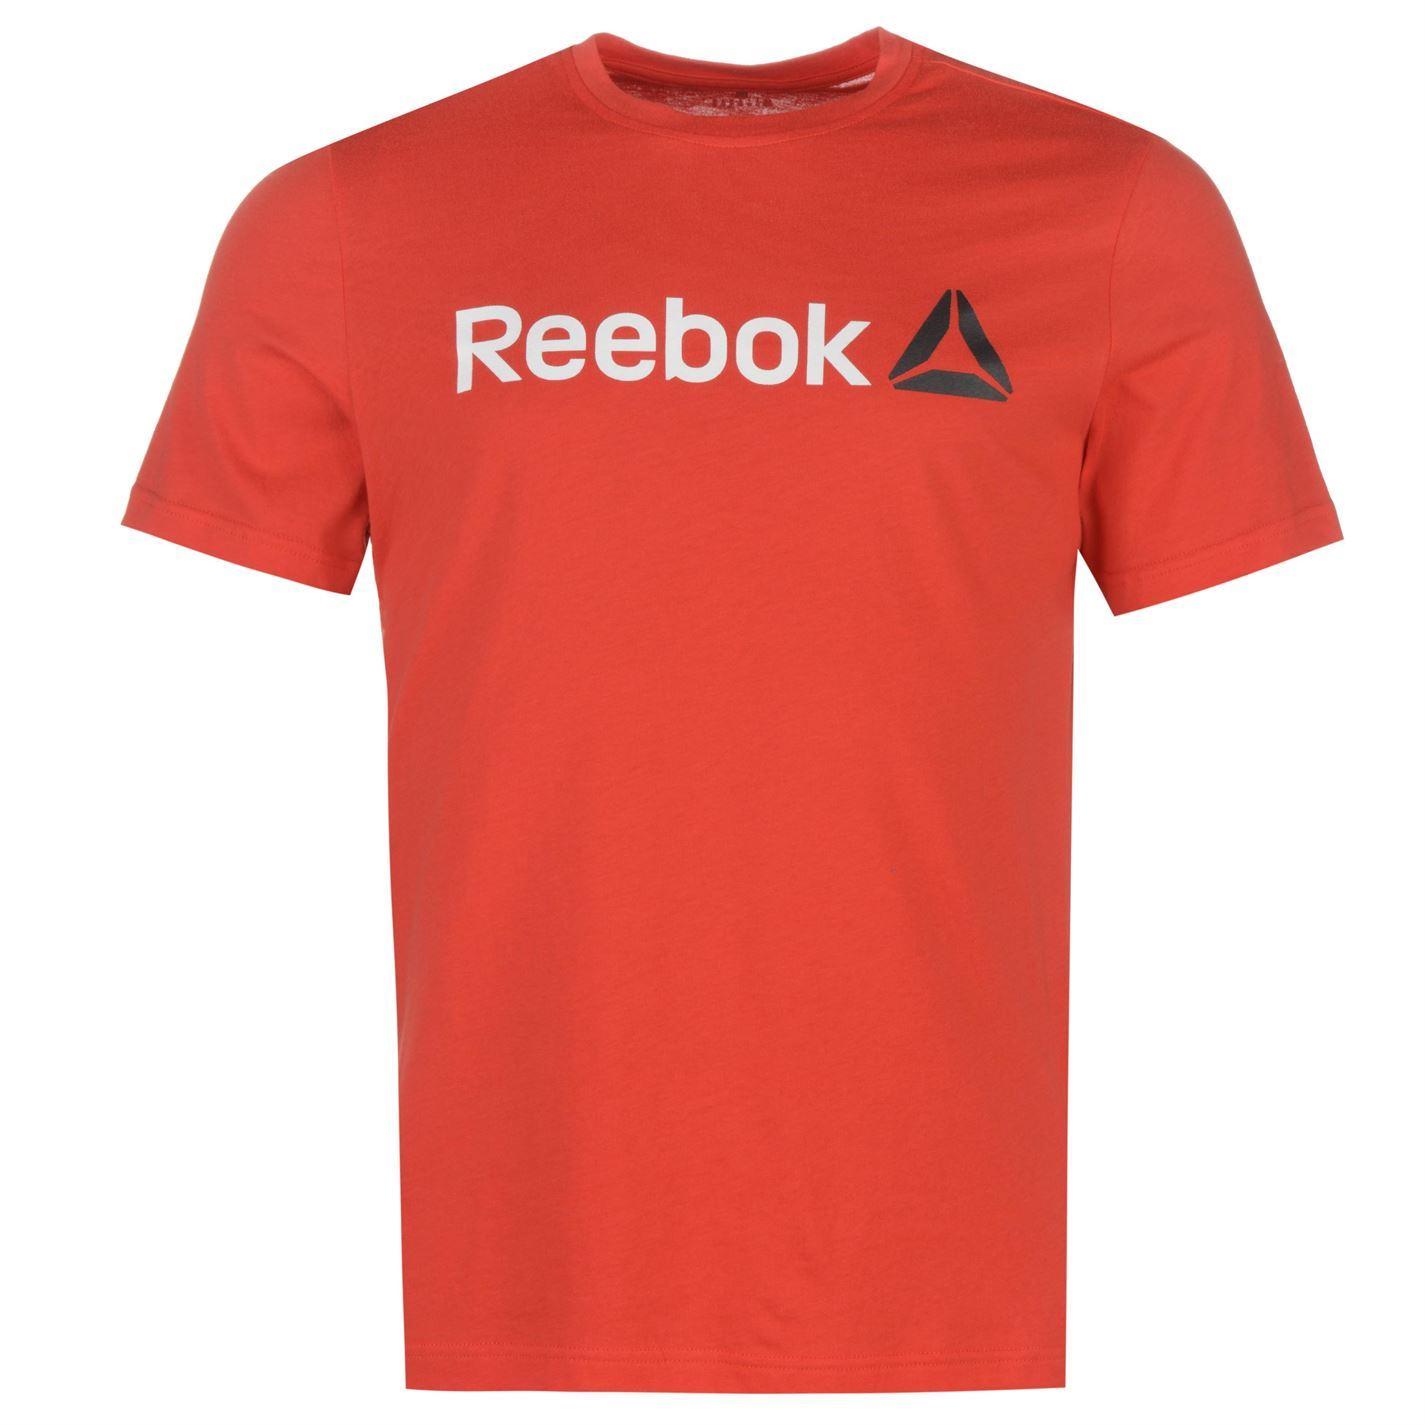 Reebok-Delta-Logo-T-Shirt-Mens-Tee-Shirt-Top thumbnail 32